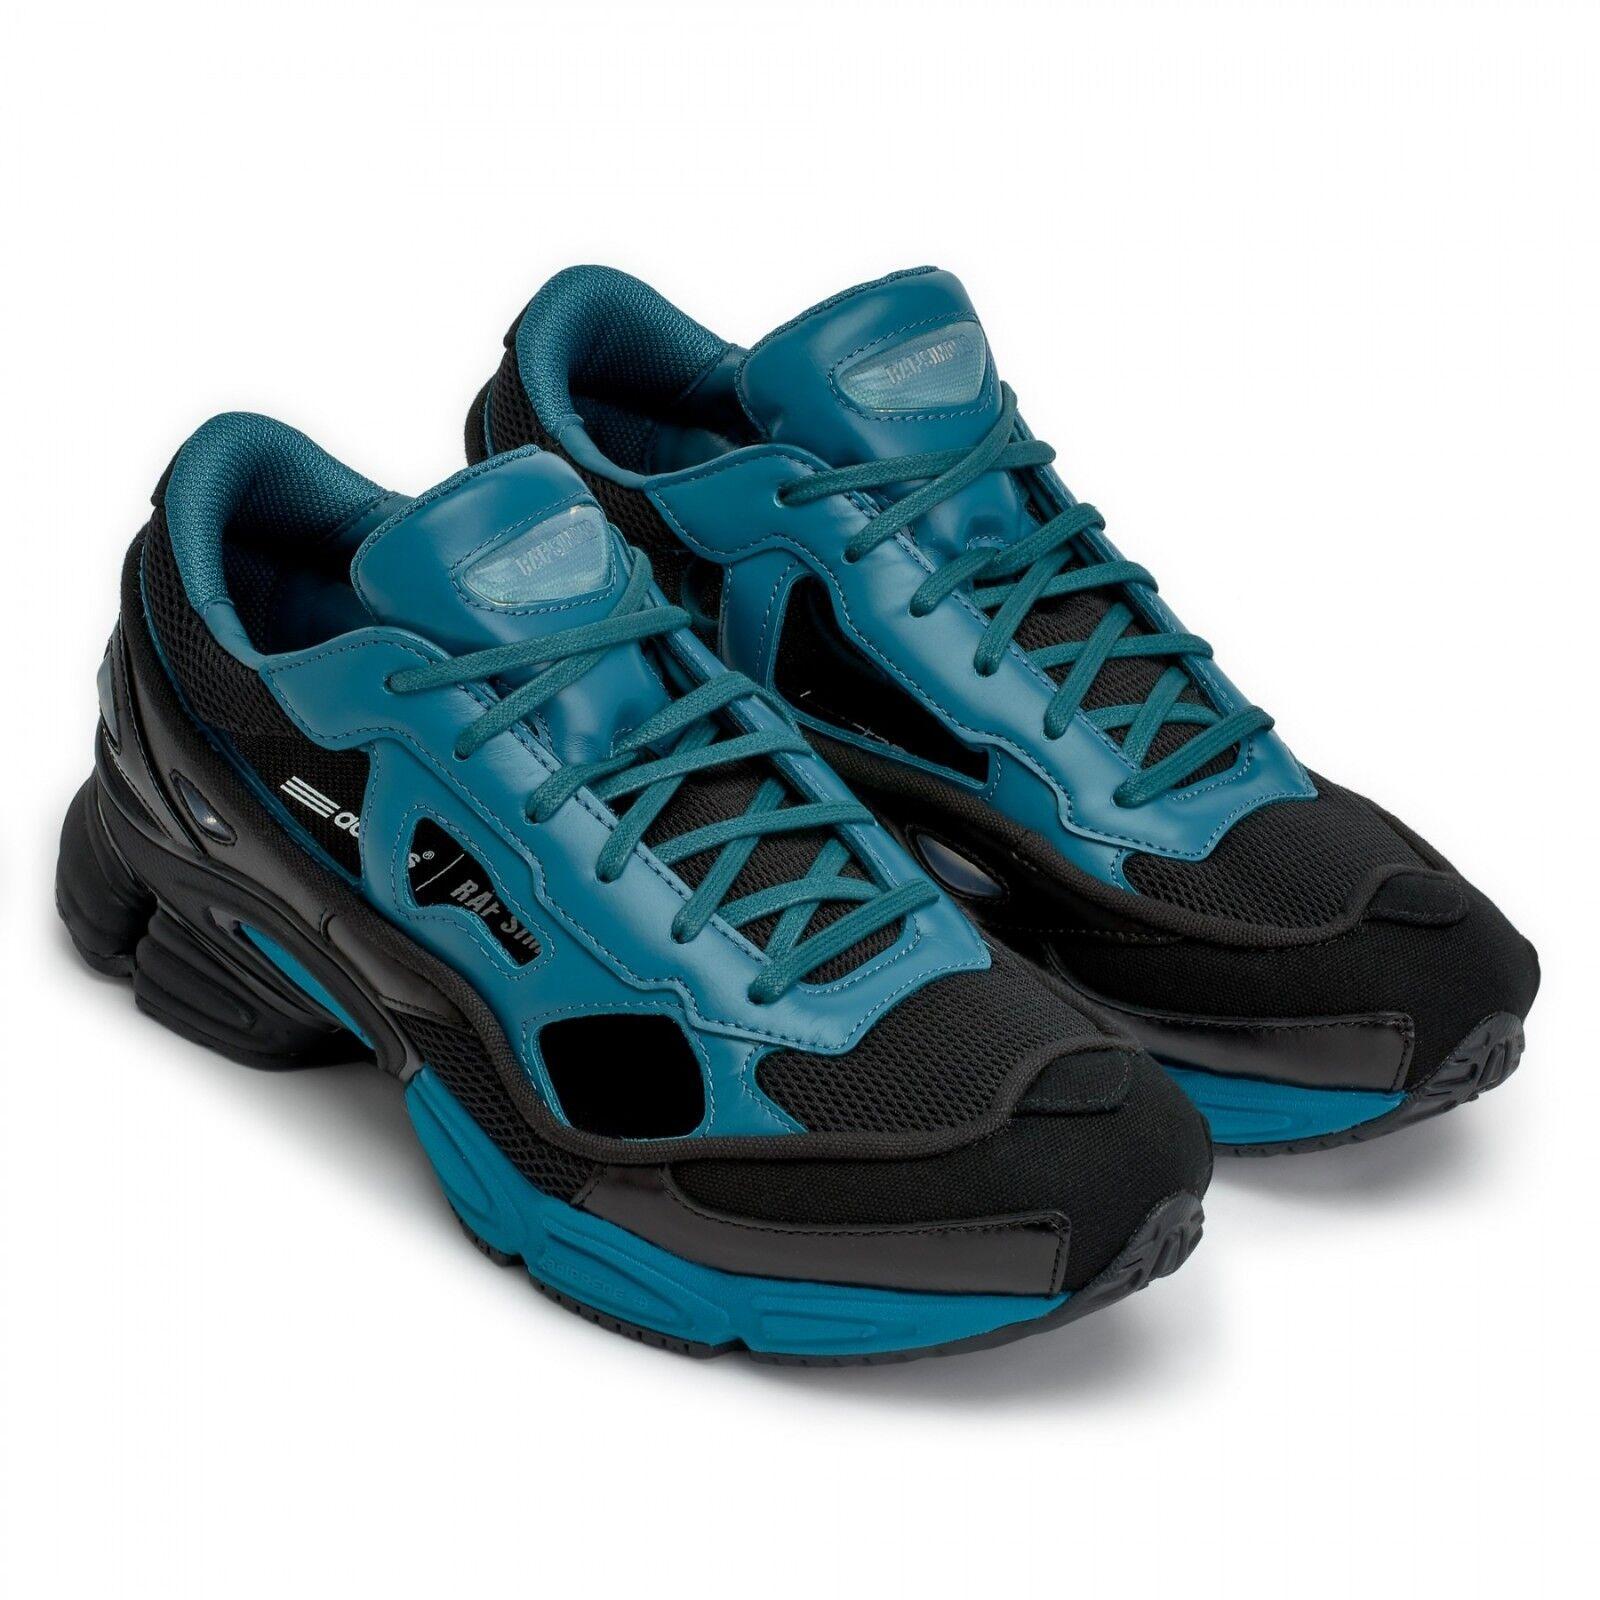 Adidas X Raf Simons RS Ozweego Replicant Black   bluee   Black